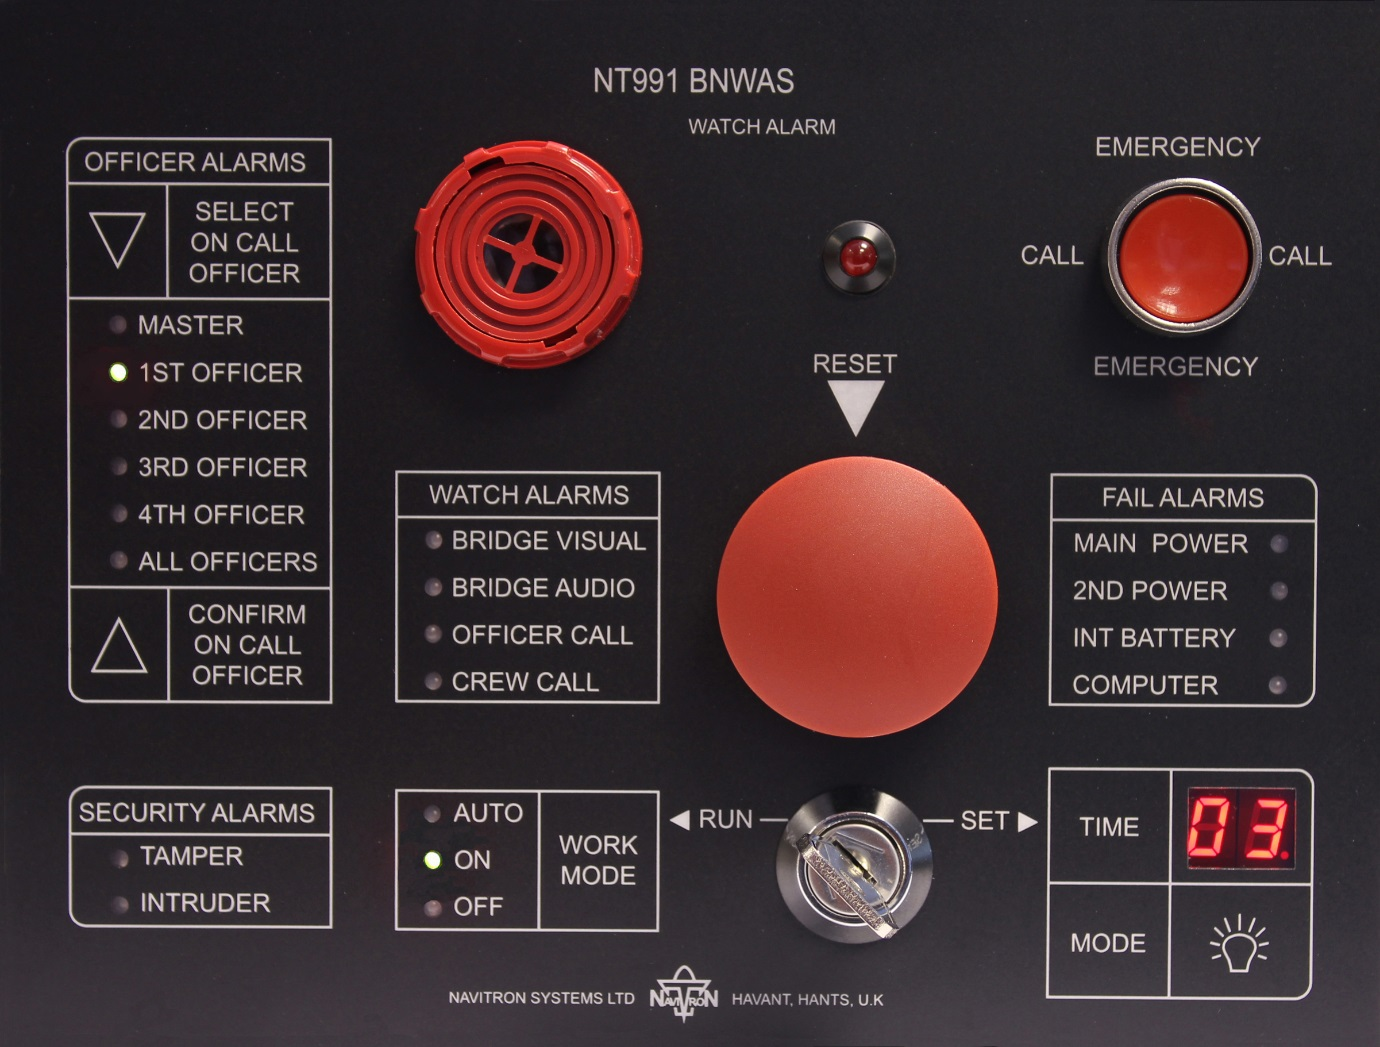 NAVITRON BRIDGE NAVIGATIONAL WATCH ALARM SYSTEM (BNWAS) NT991BNWAS | Codar Pte Ltd